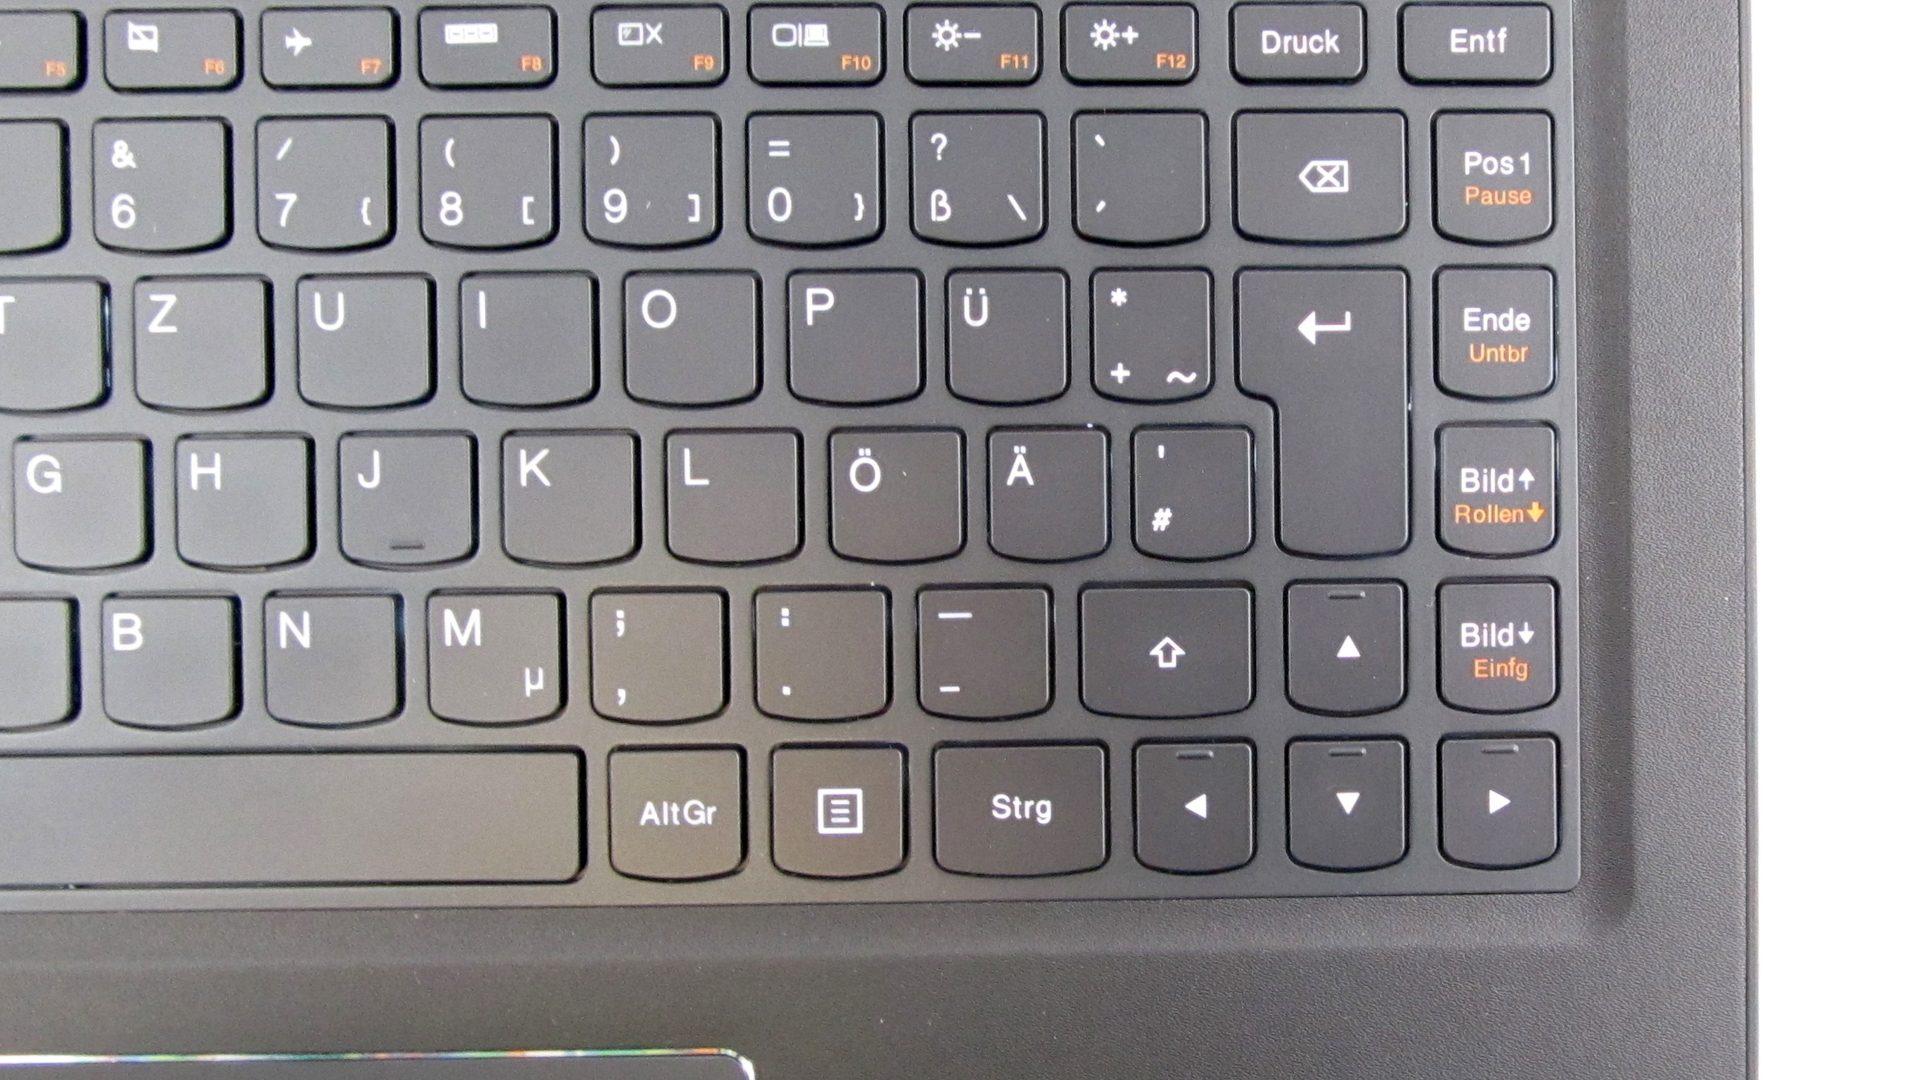 lenovo_yoga_900_13_silver_tastatur_3